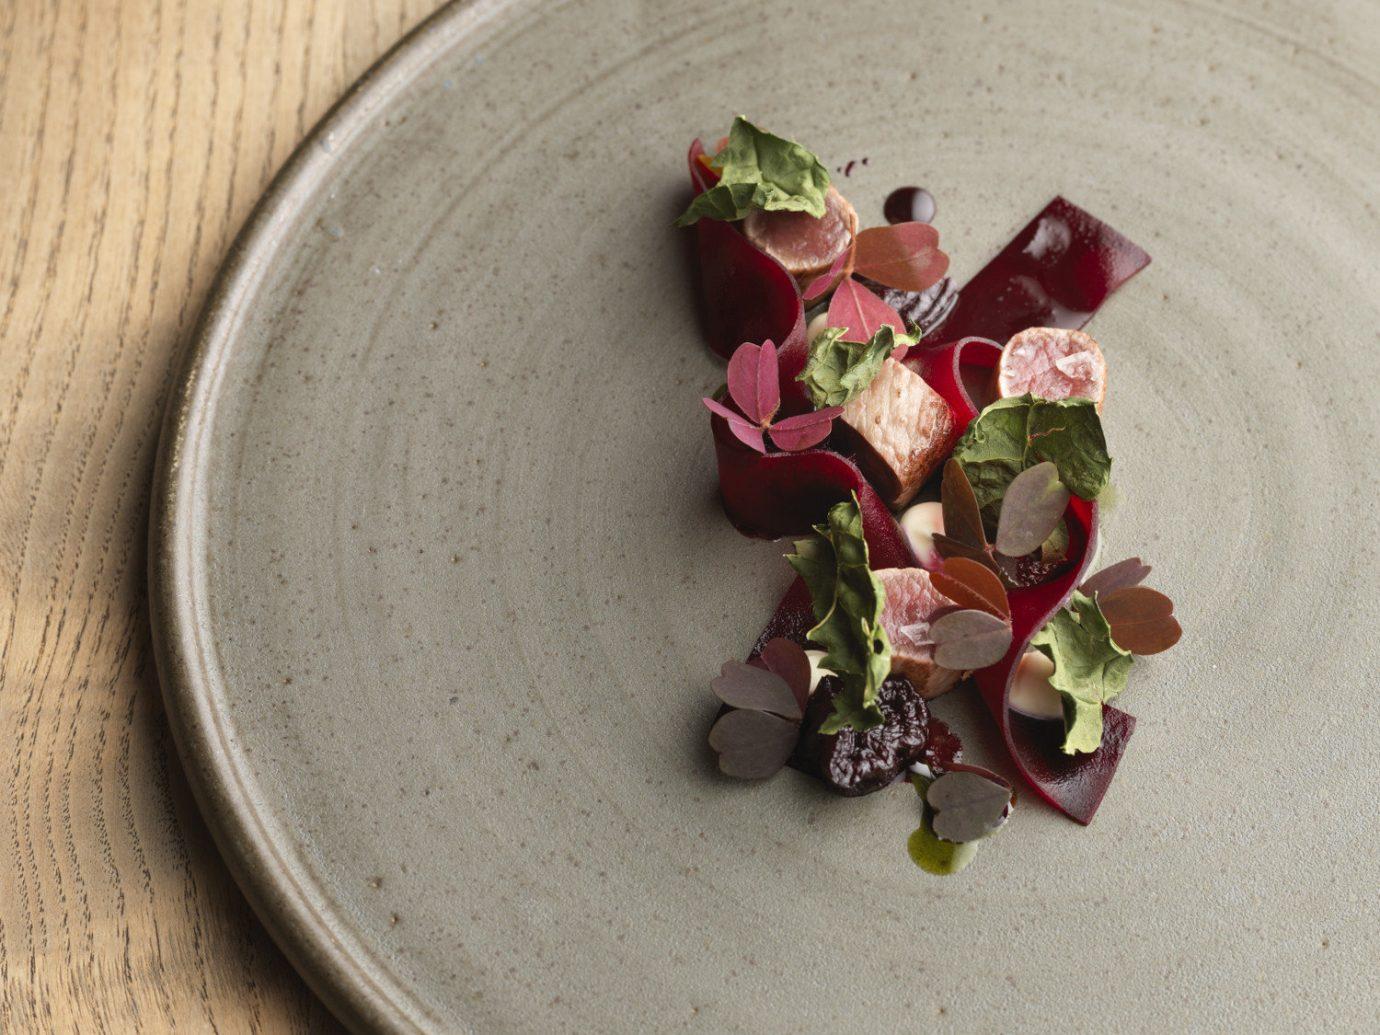 plate dish food produce wooden vegetable dishware flower